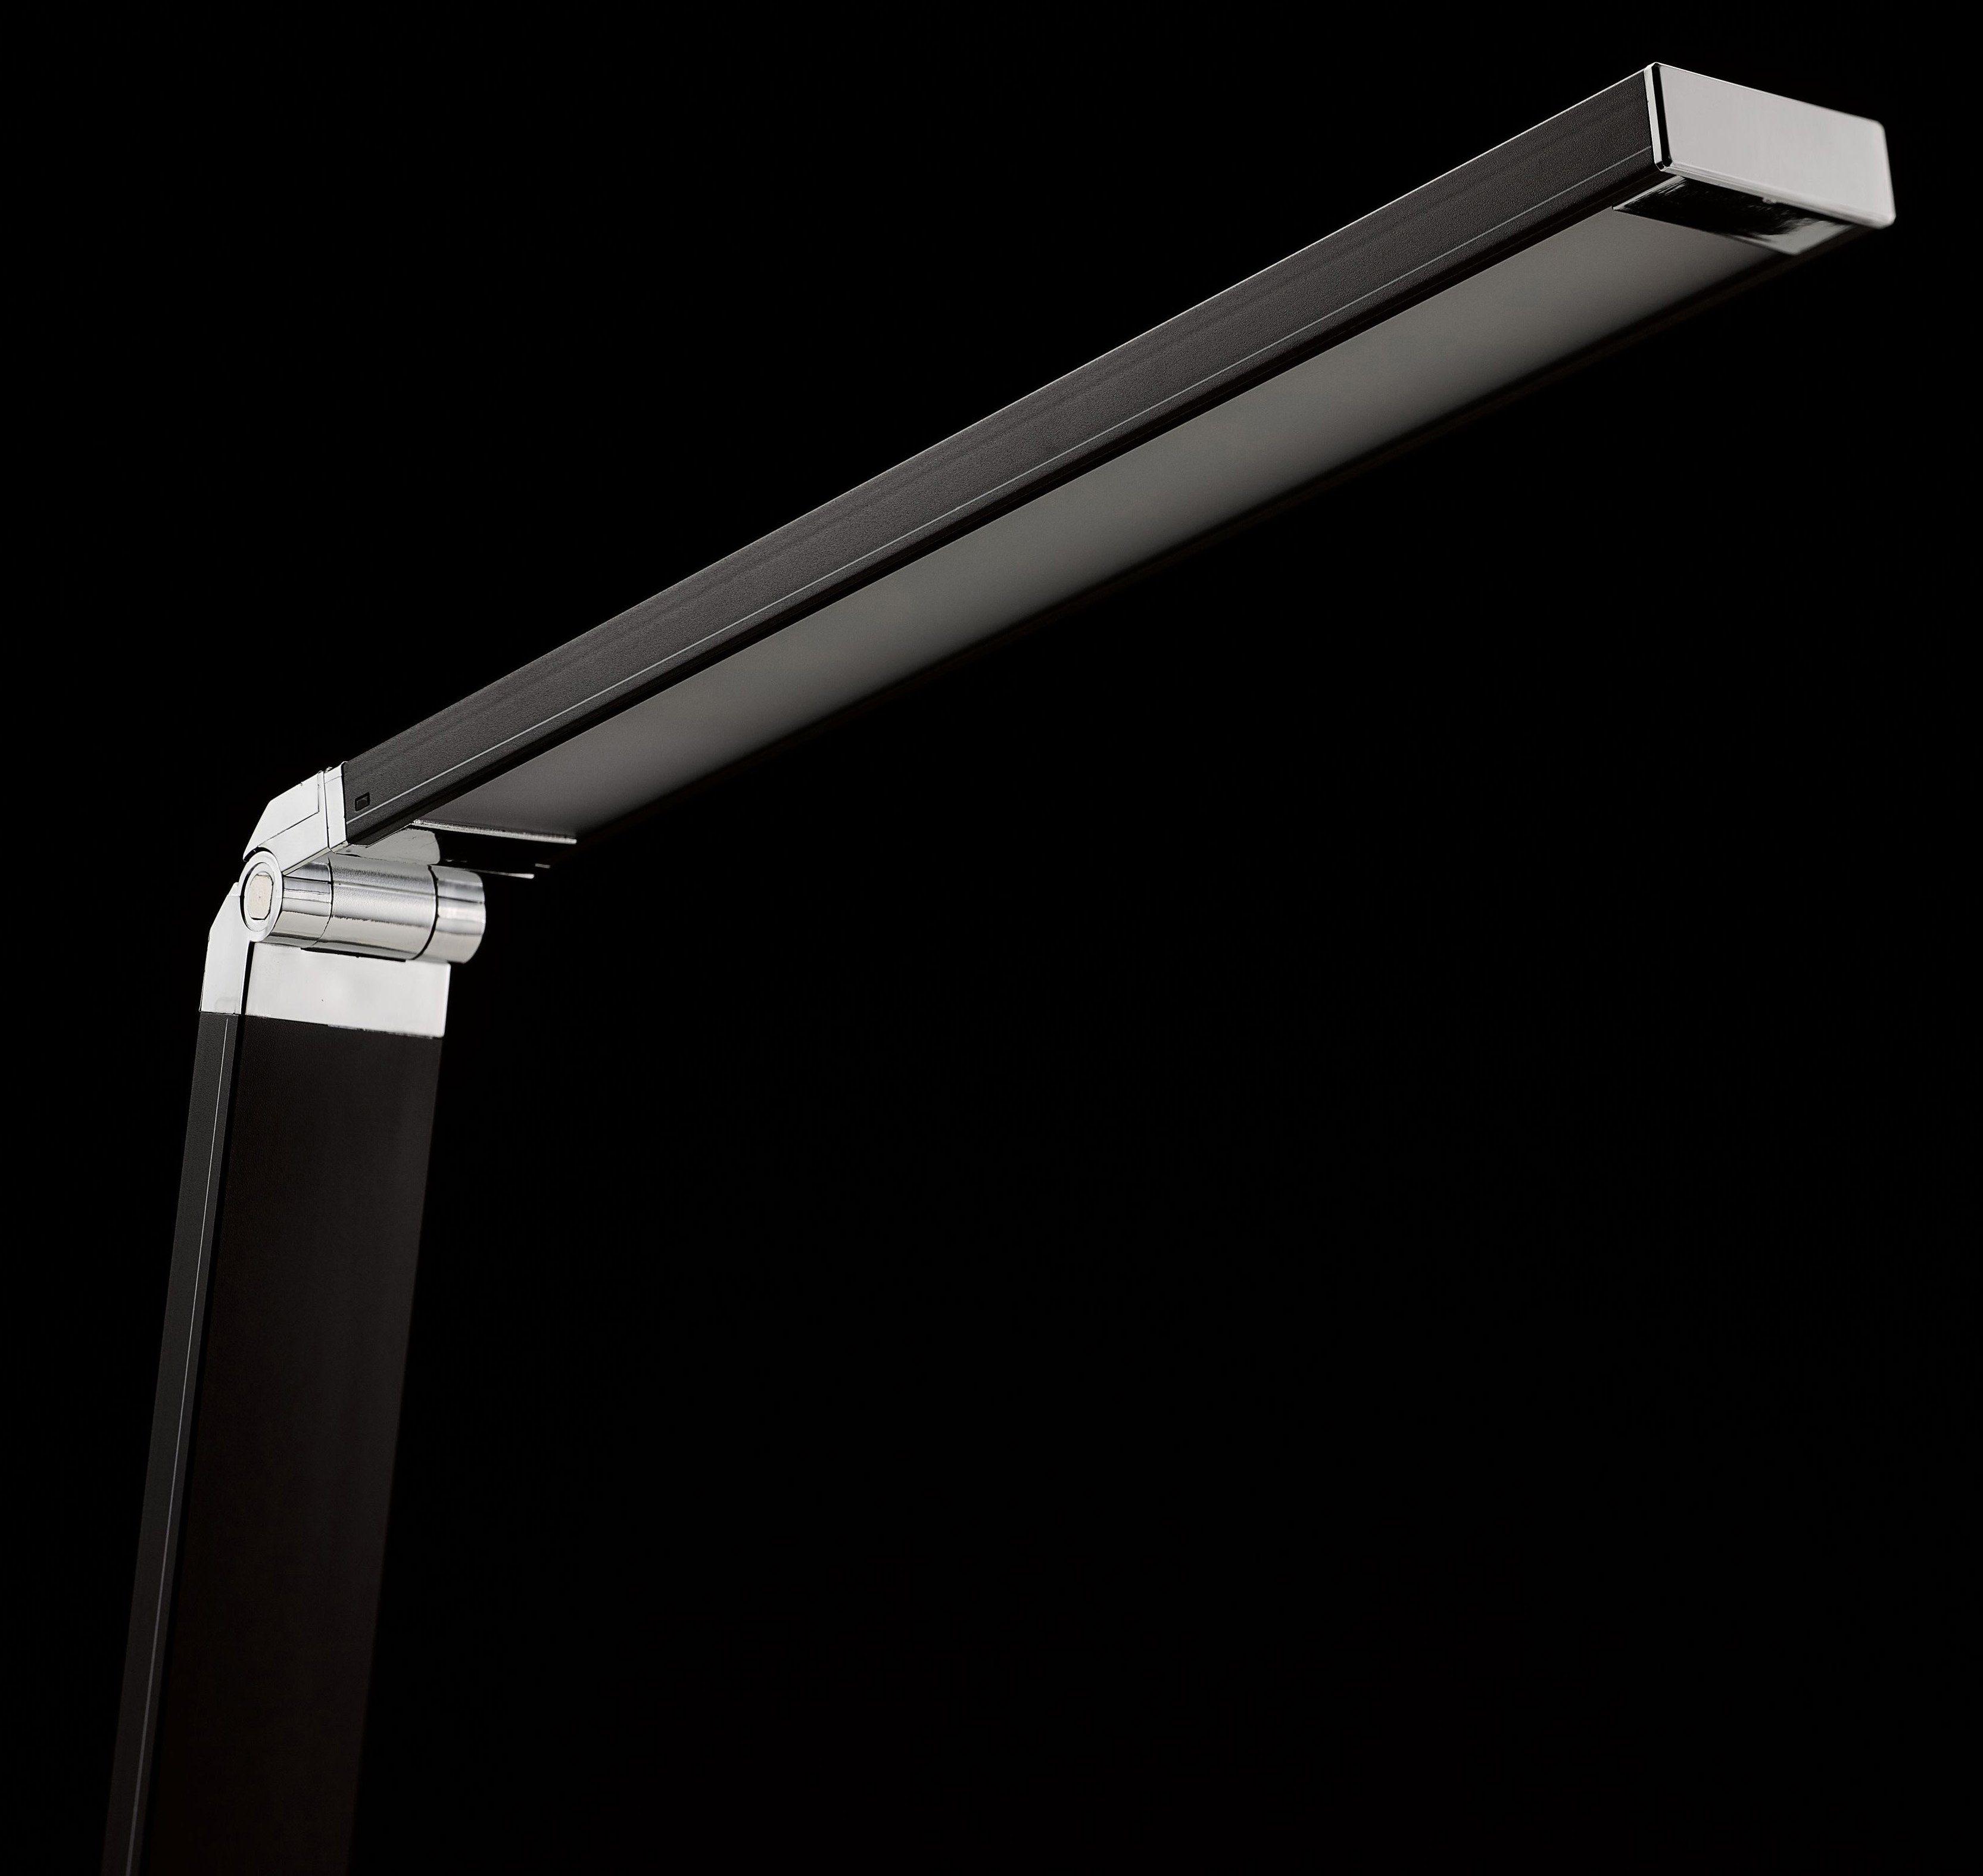 daglicht tafellamp met hightech features